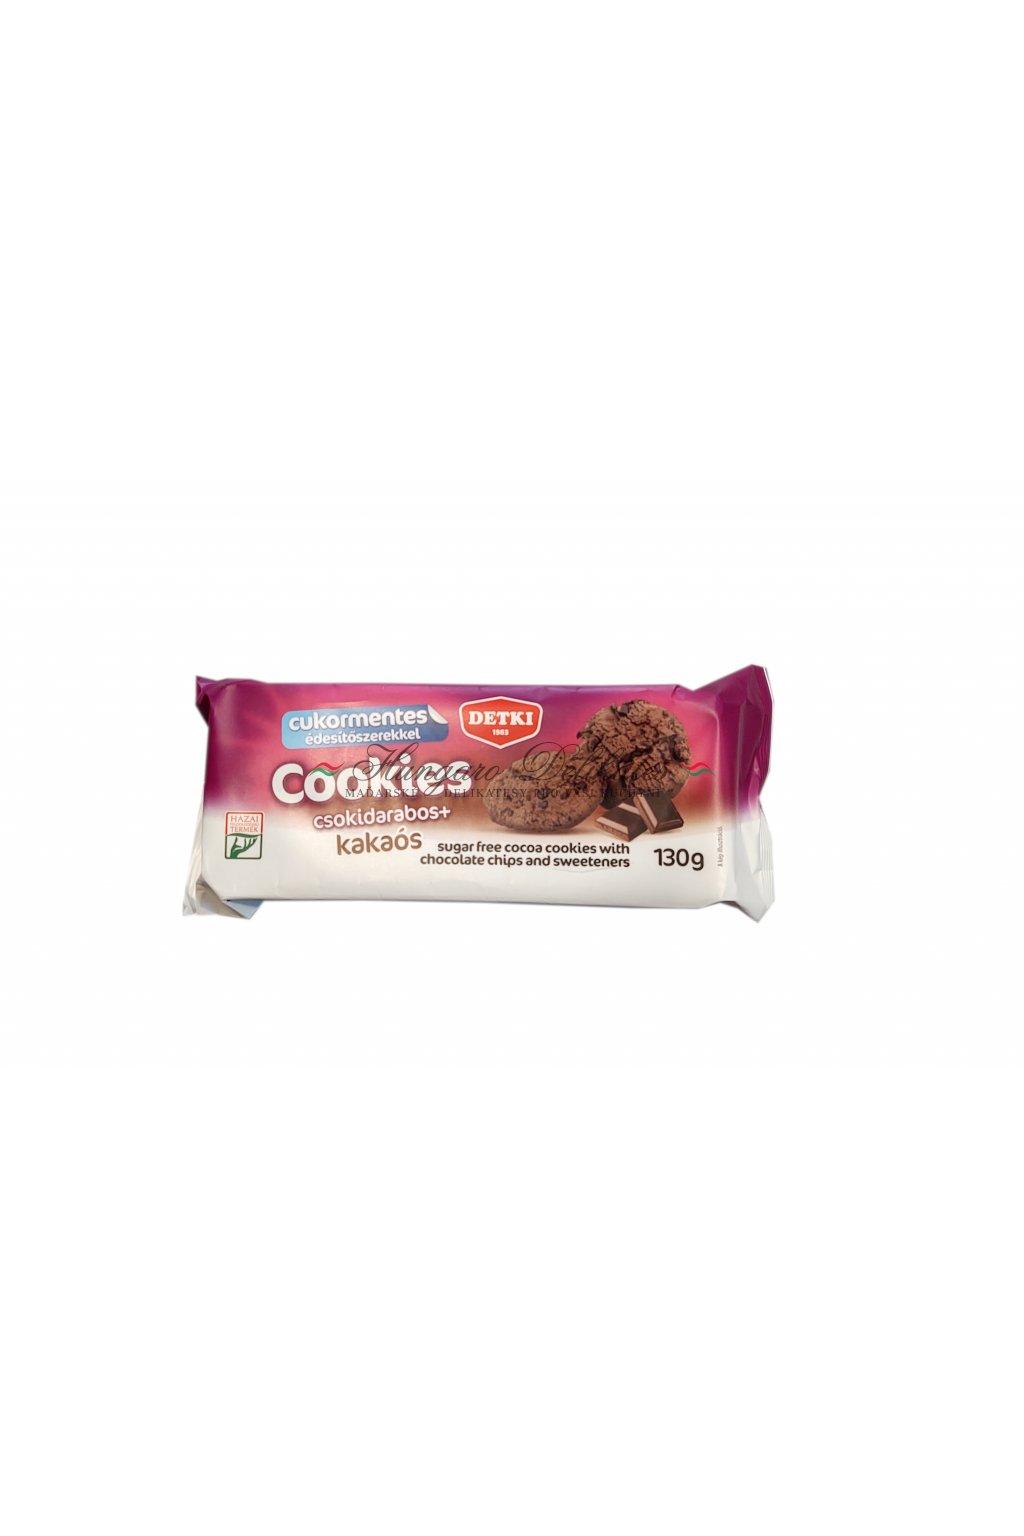 Kakaové cookies s kousky čokolády, bez cukru